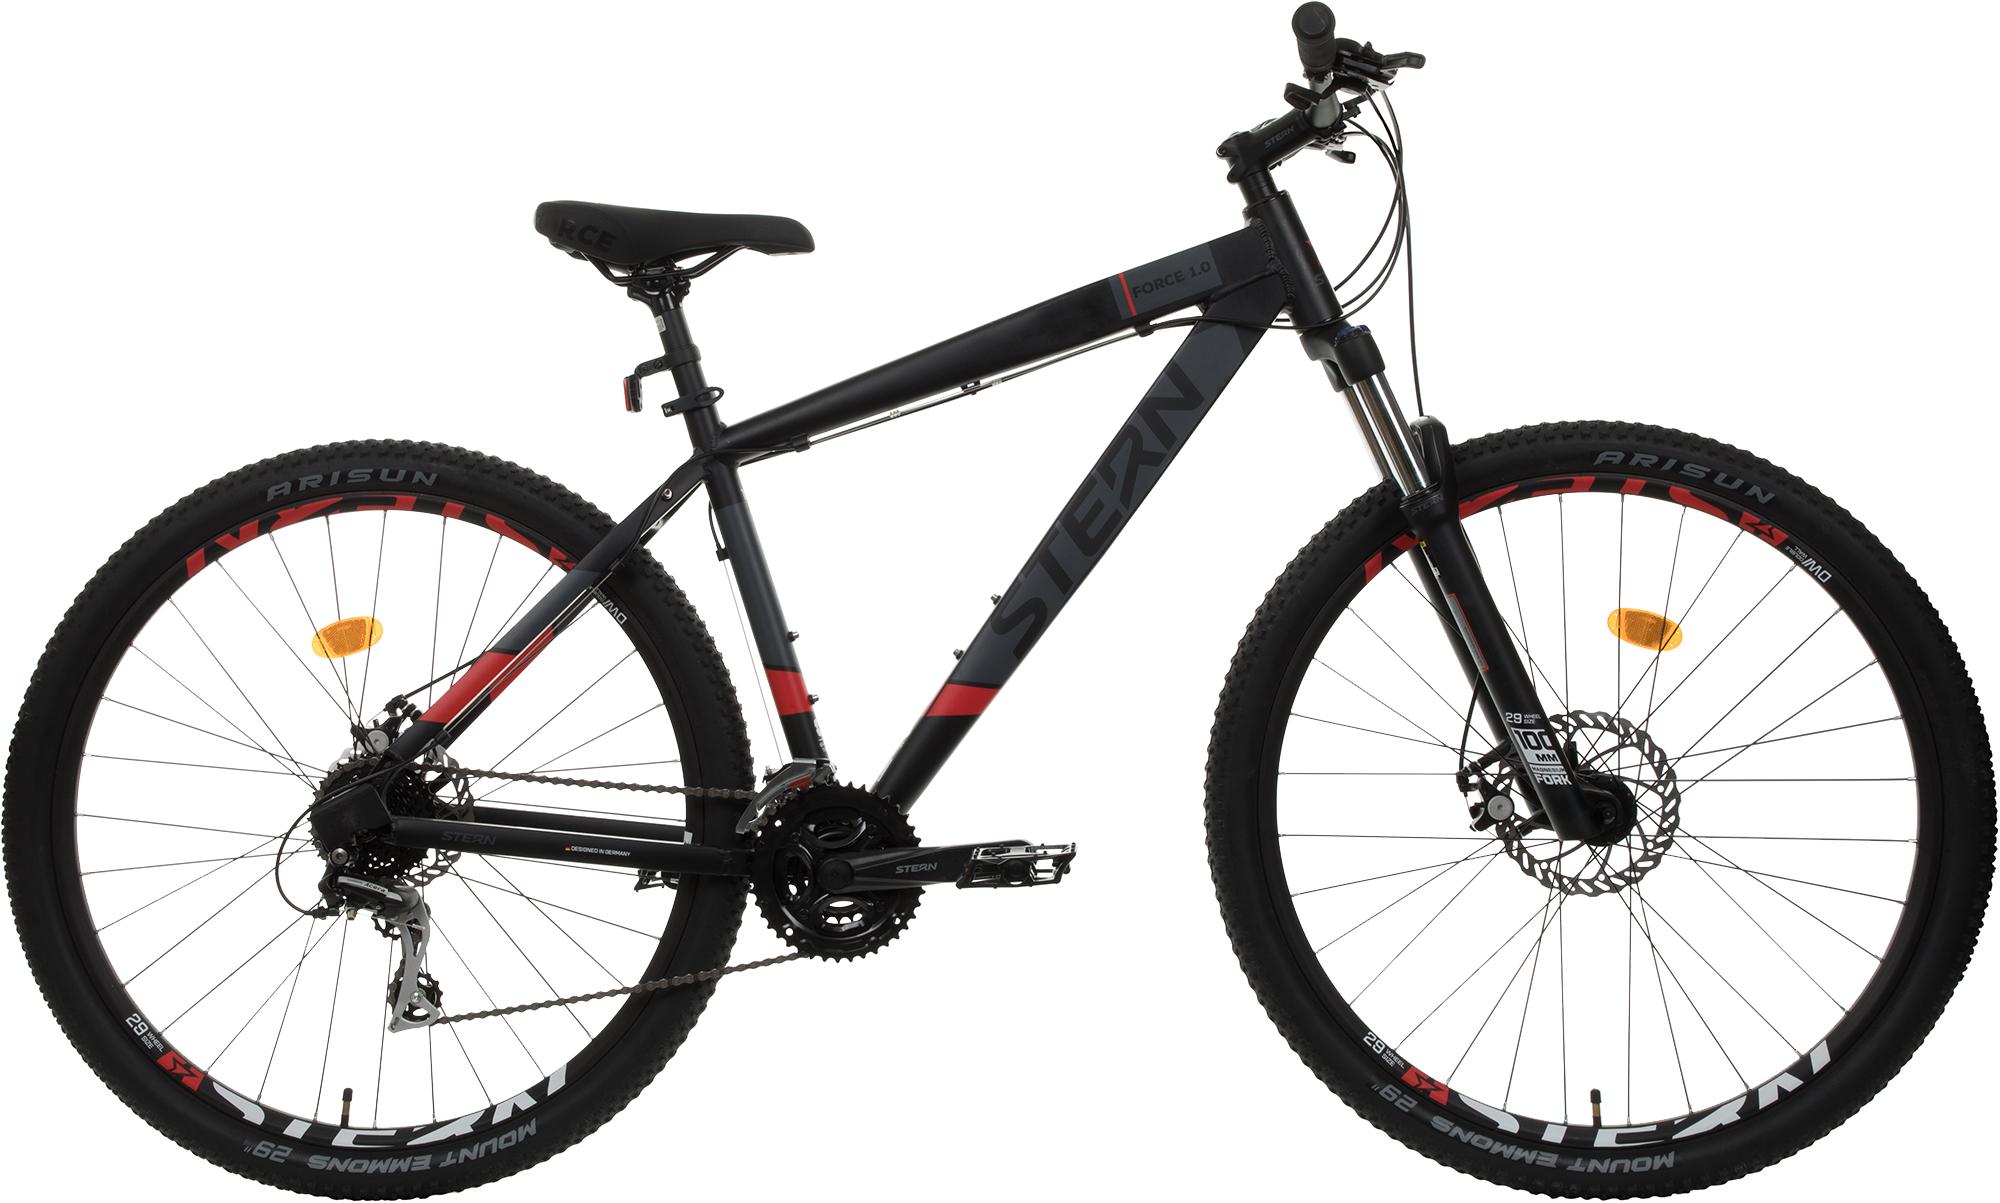 Stern Велосипед горный Force 1.0 29